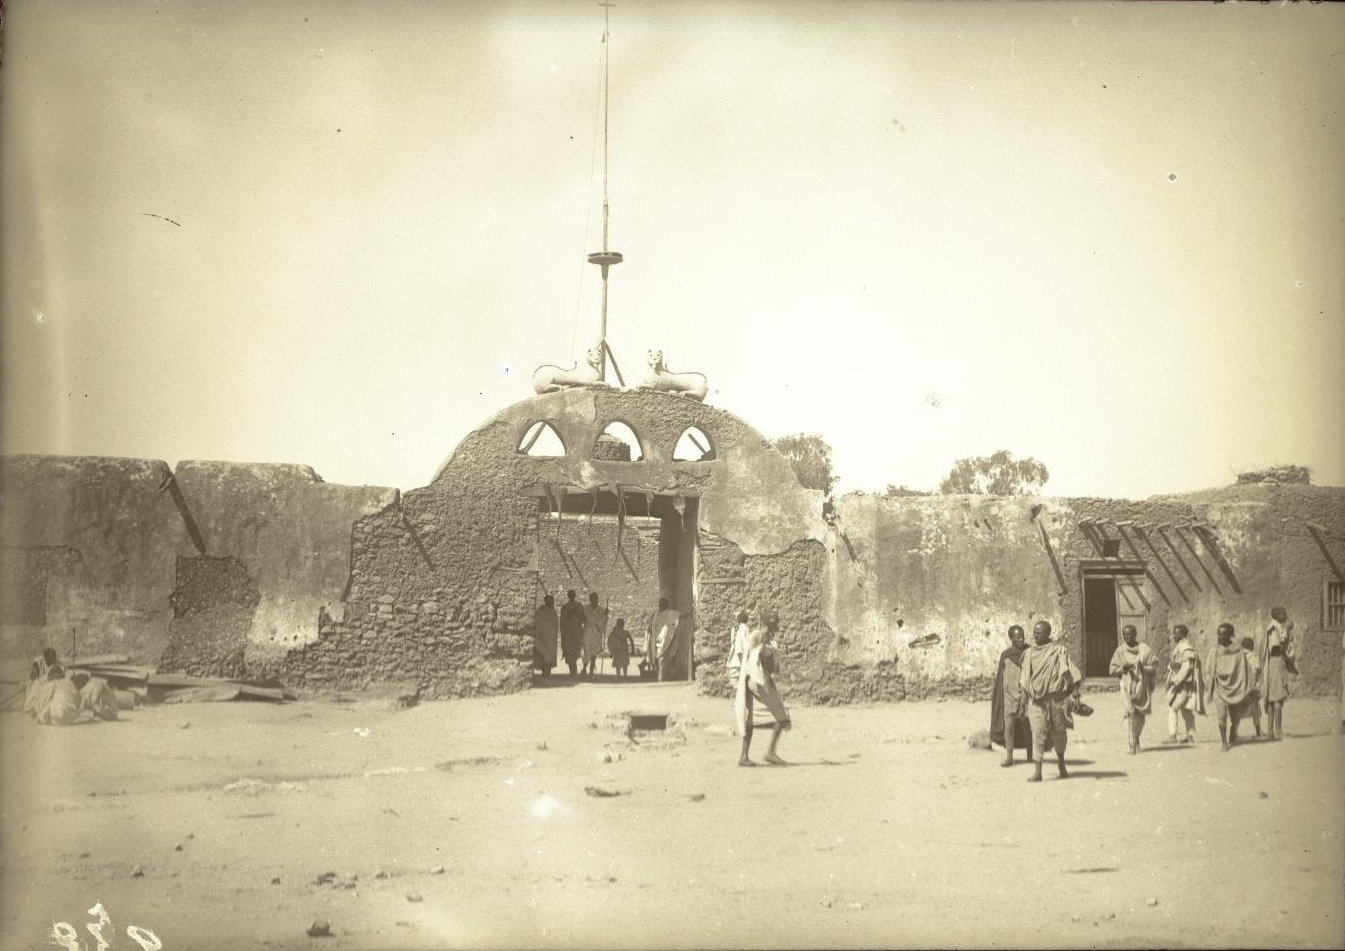 232. Абиссиния, провинция Харар, г. Харар. Ворота старого дворца раса (правителя) Маконена